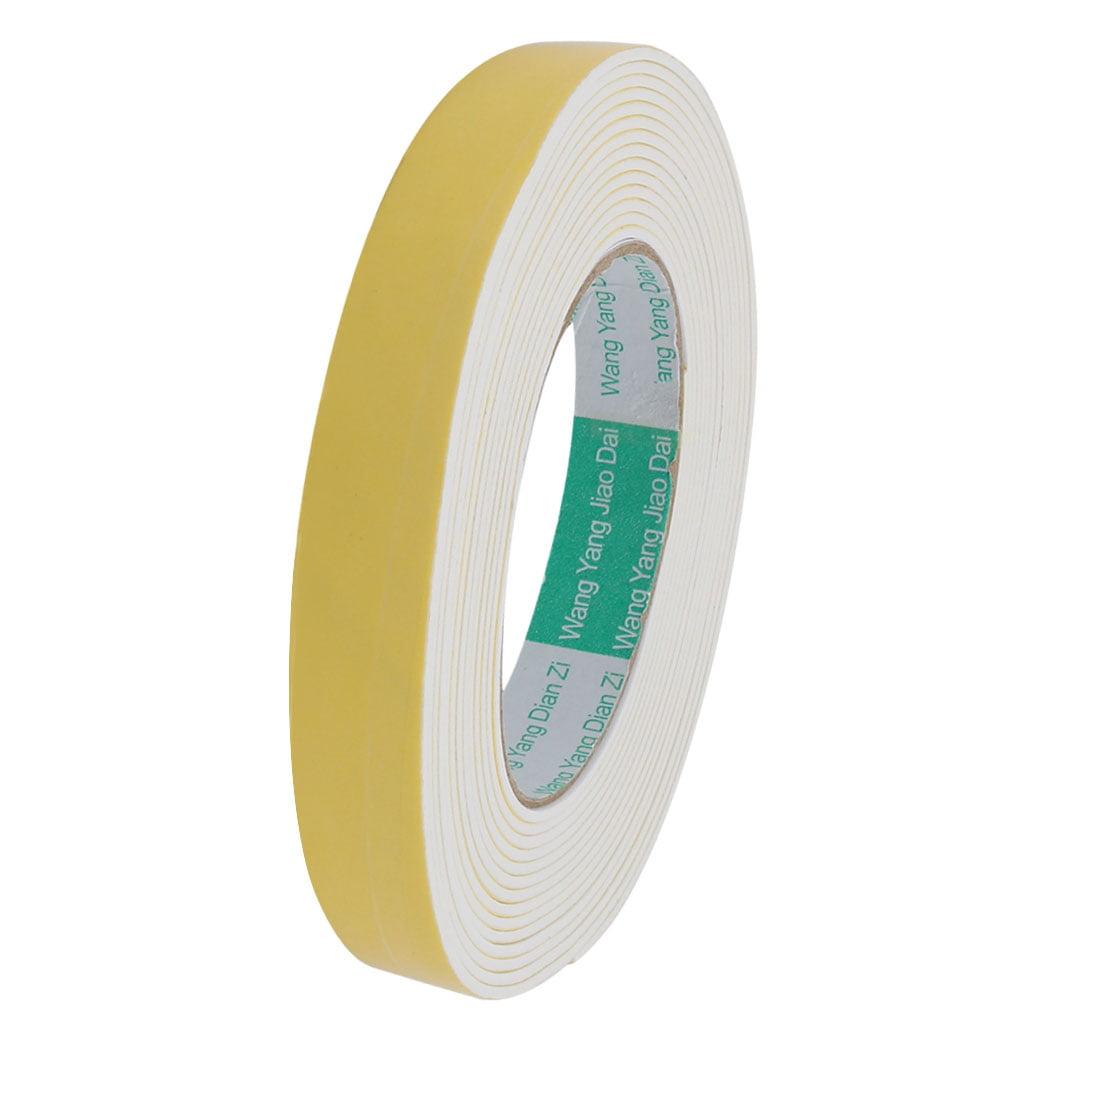 Unique Bargains 20mm Width 2mm Thickness Single-side Sealed Sponge Tape White 16.4ft Length